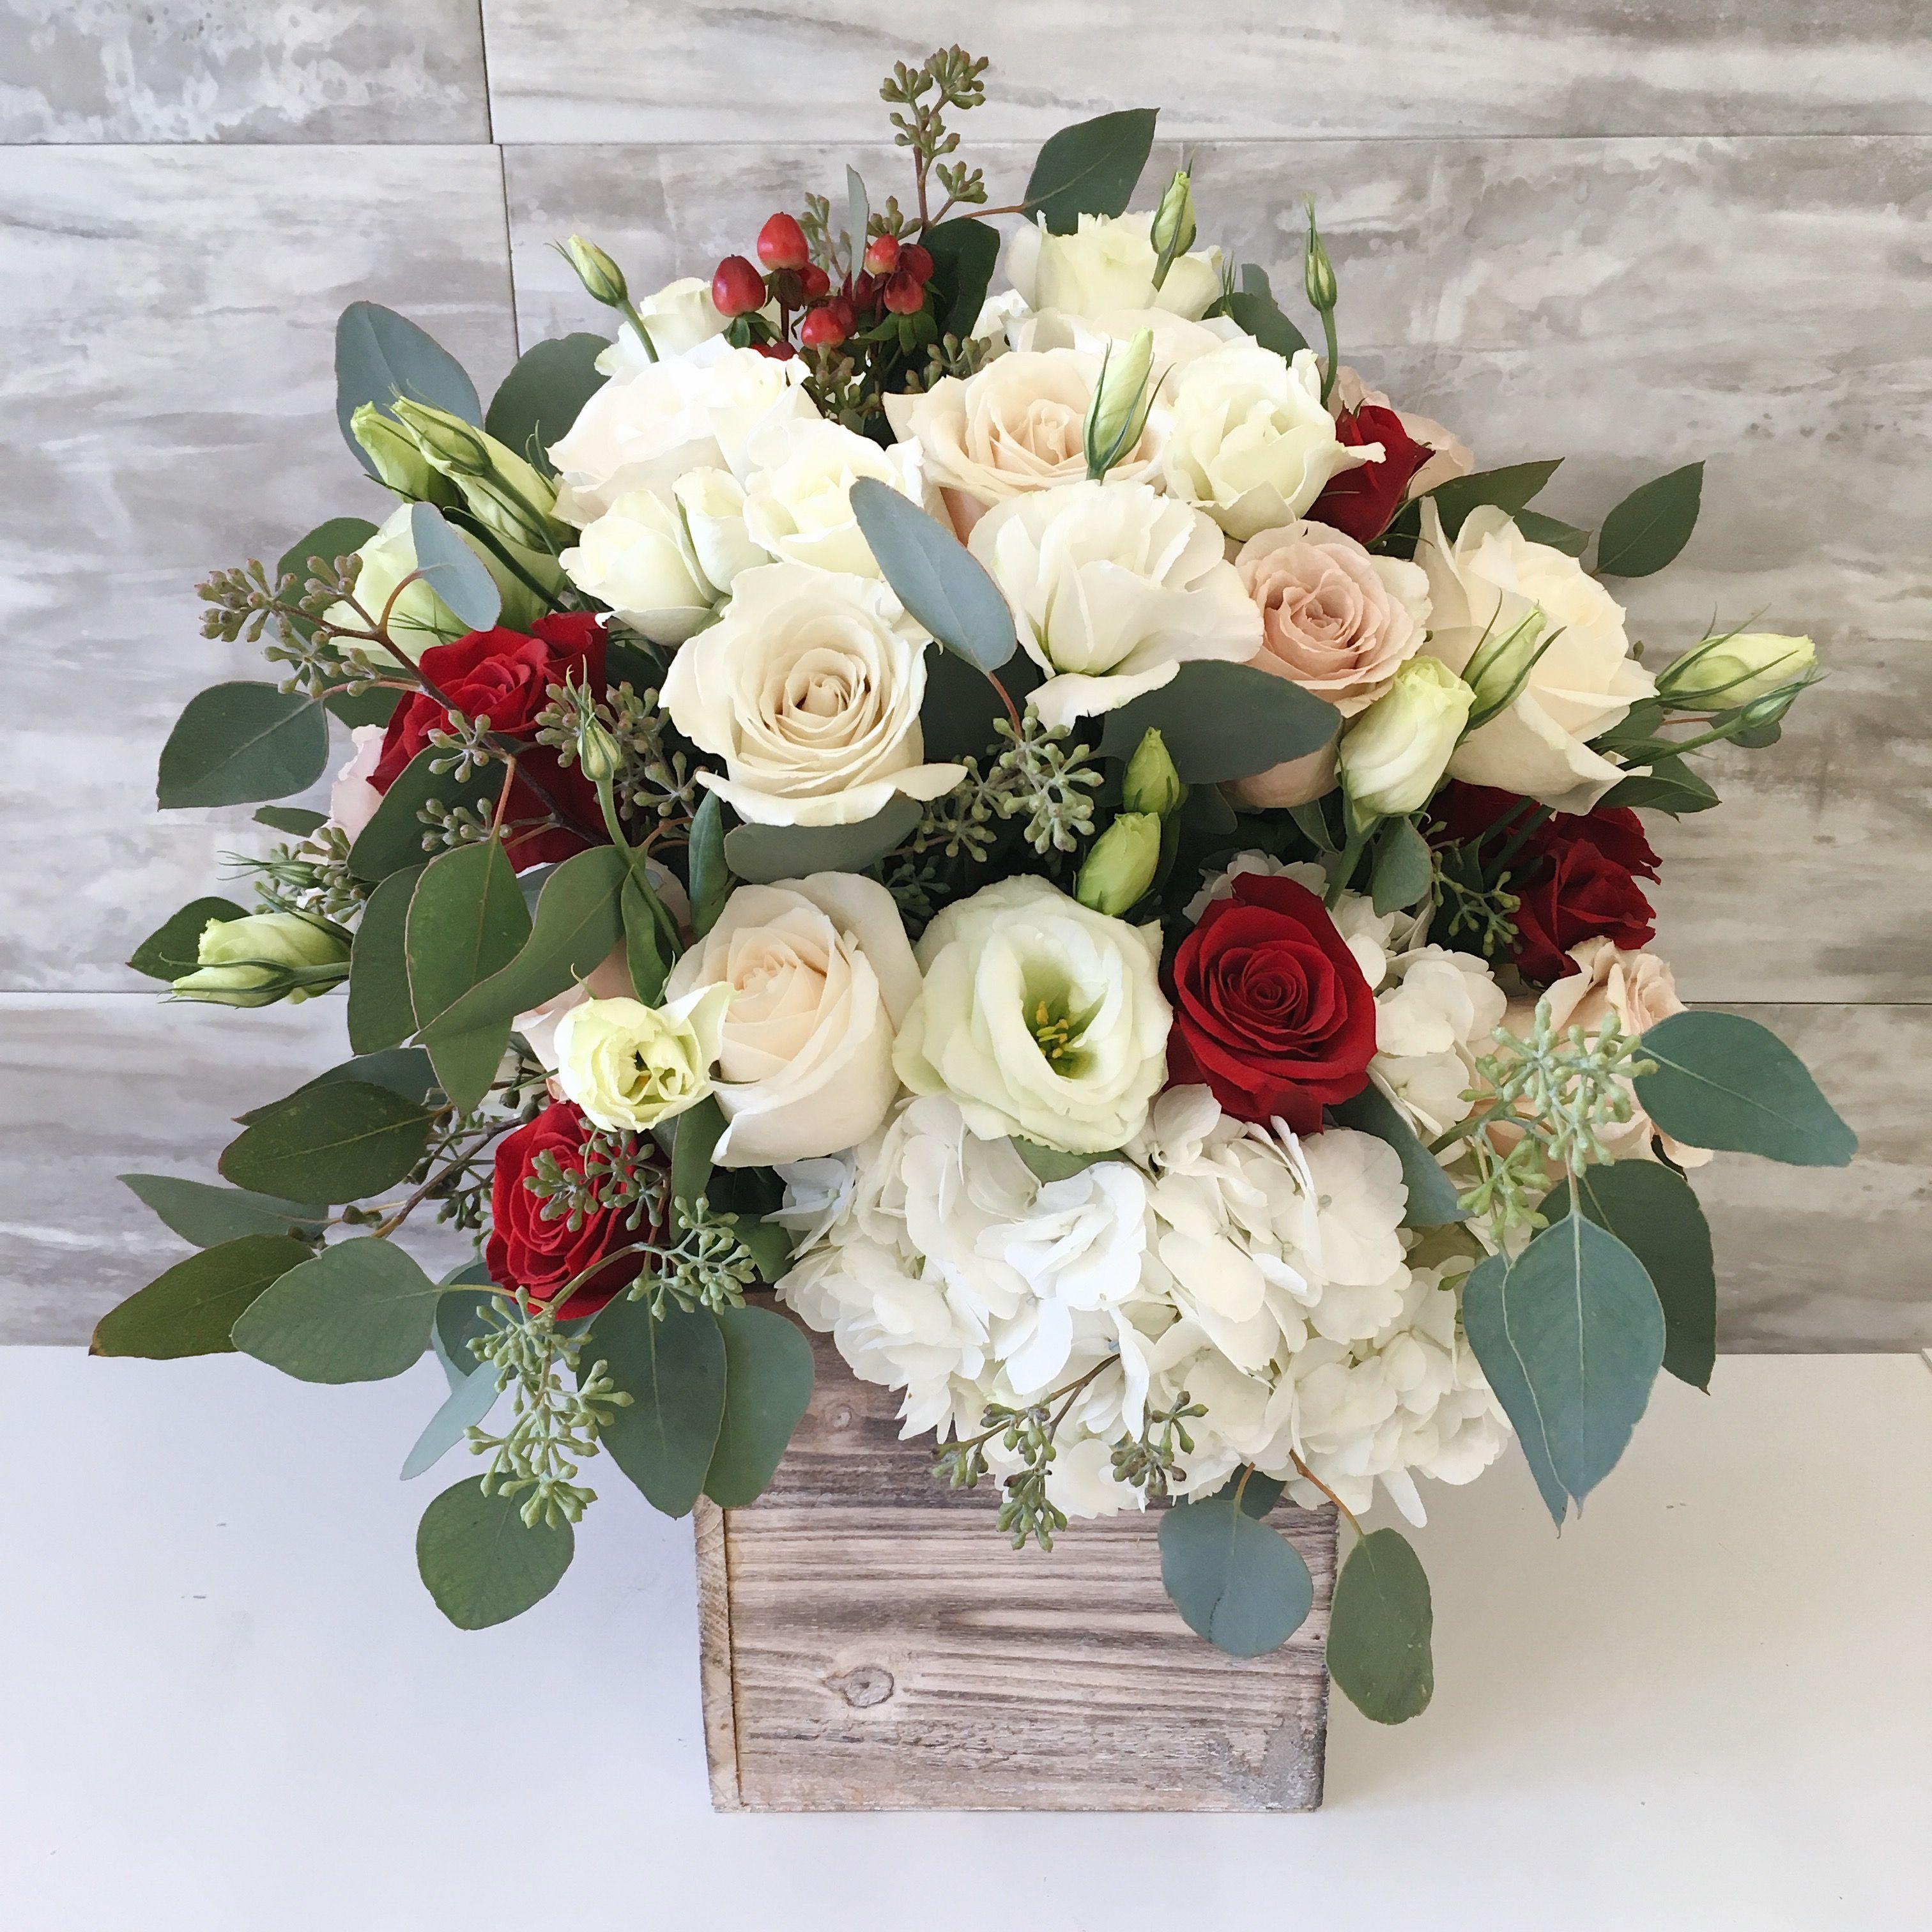 Wood Box Flower Arrangement Everyday Flowers From Kk Flowers